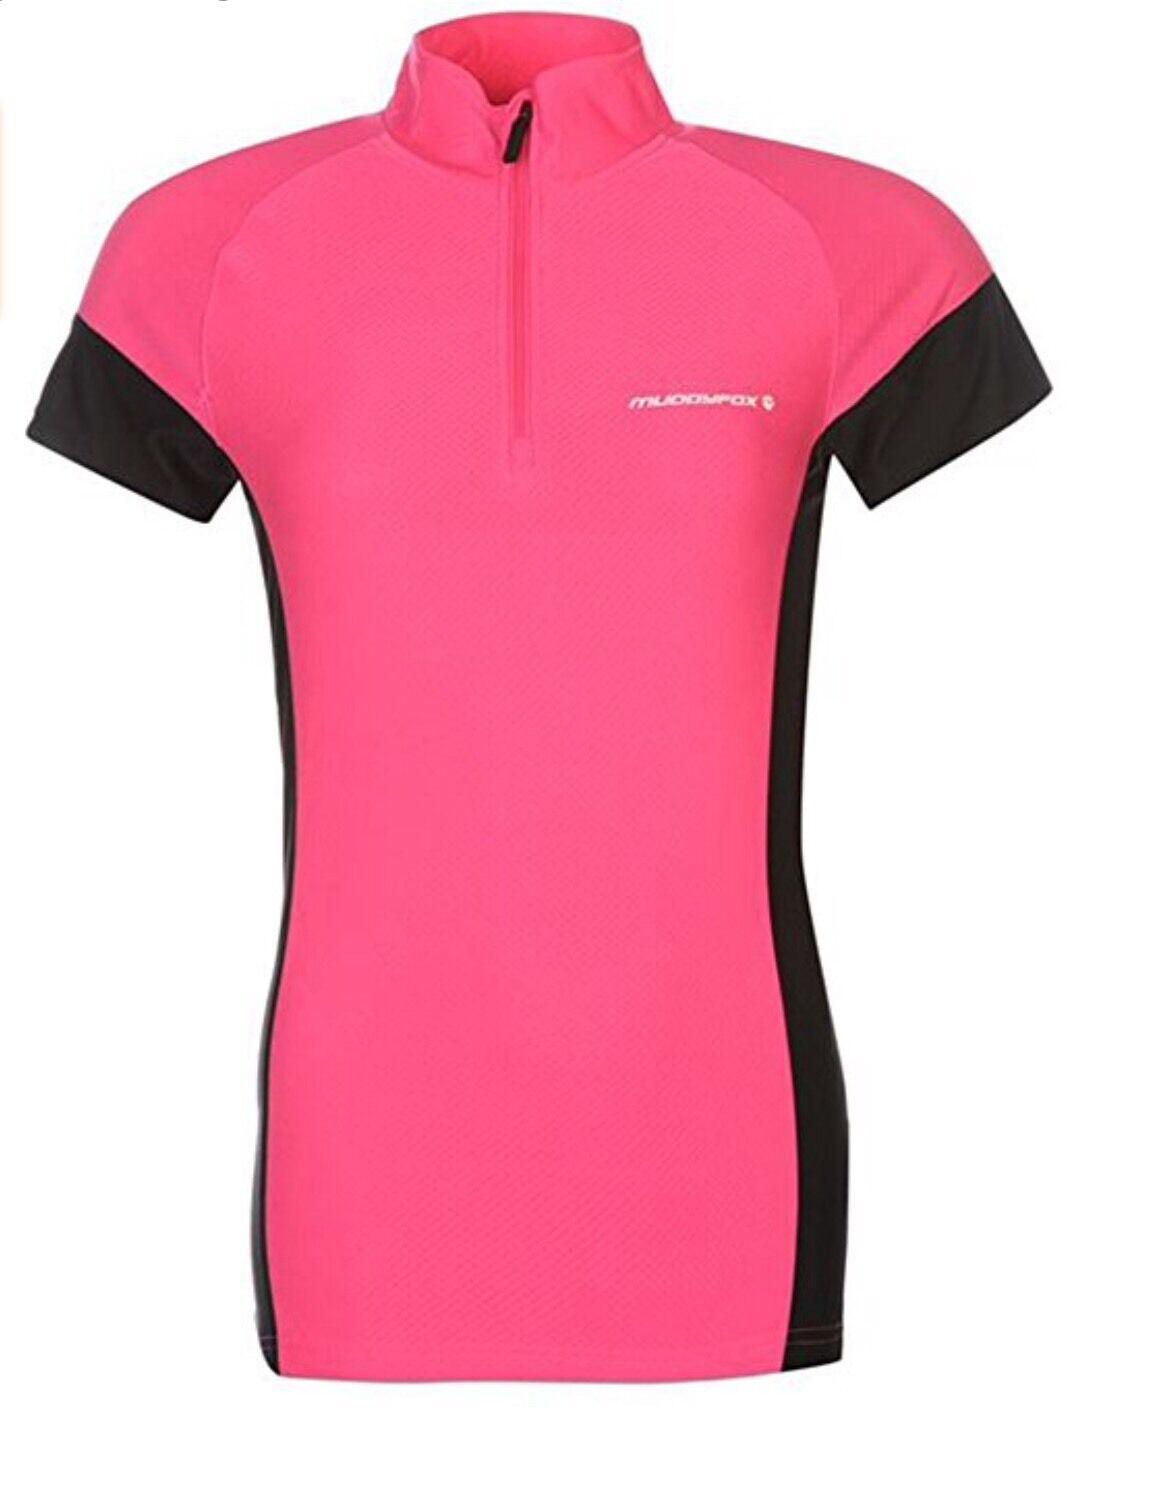 Muddy Muddy Muddy Fox-noir/rose Vélo Haut Et Rembourré Shorts-Taille 10-Bnwt 4f6f61